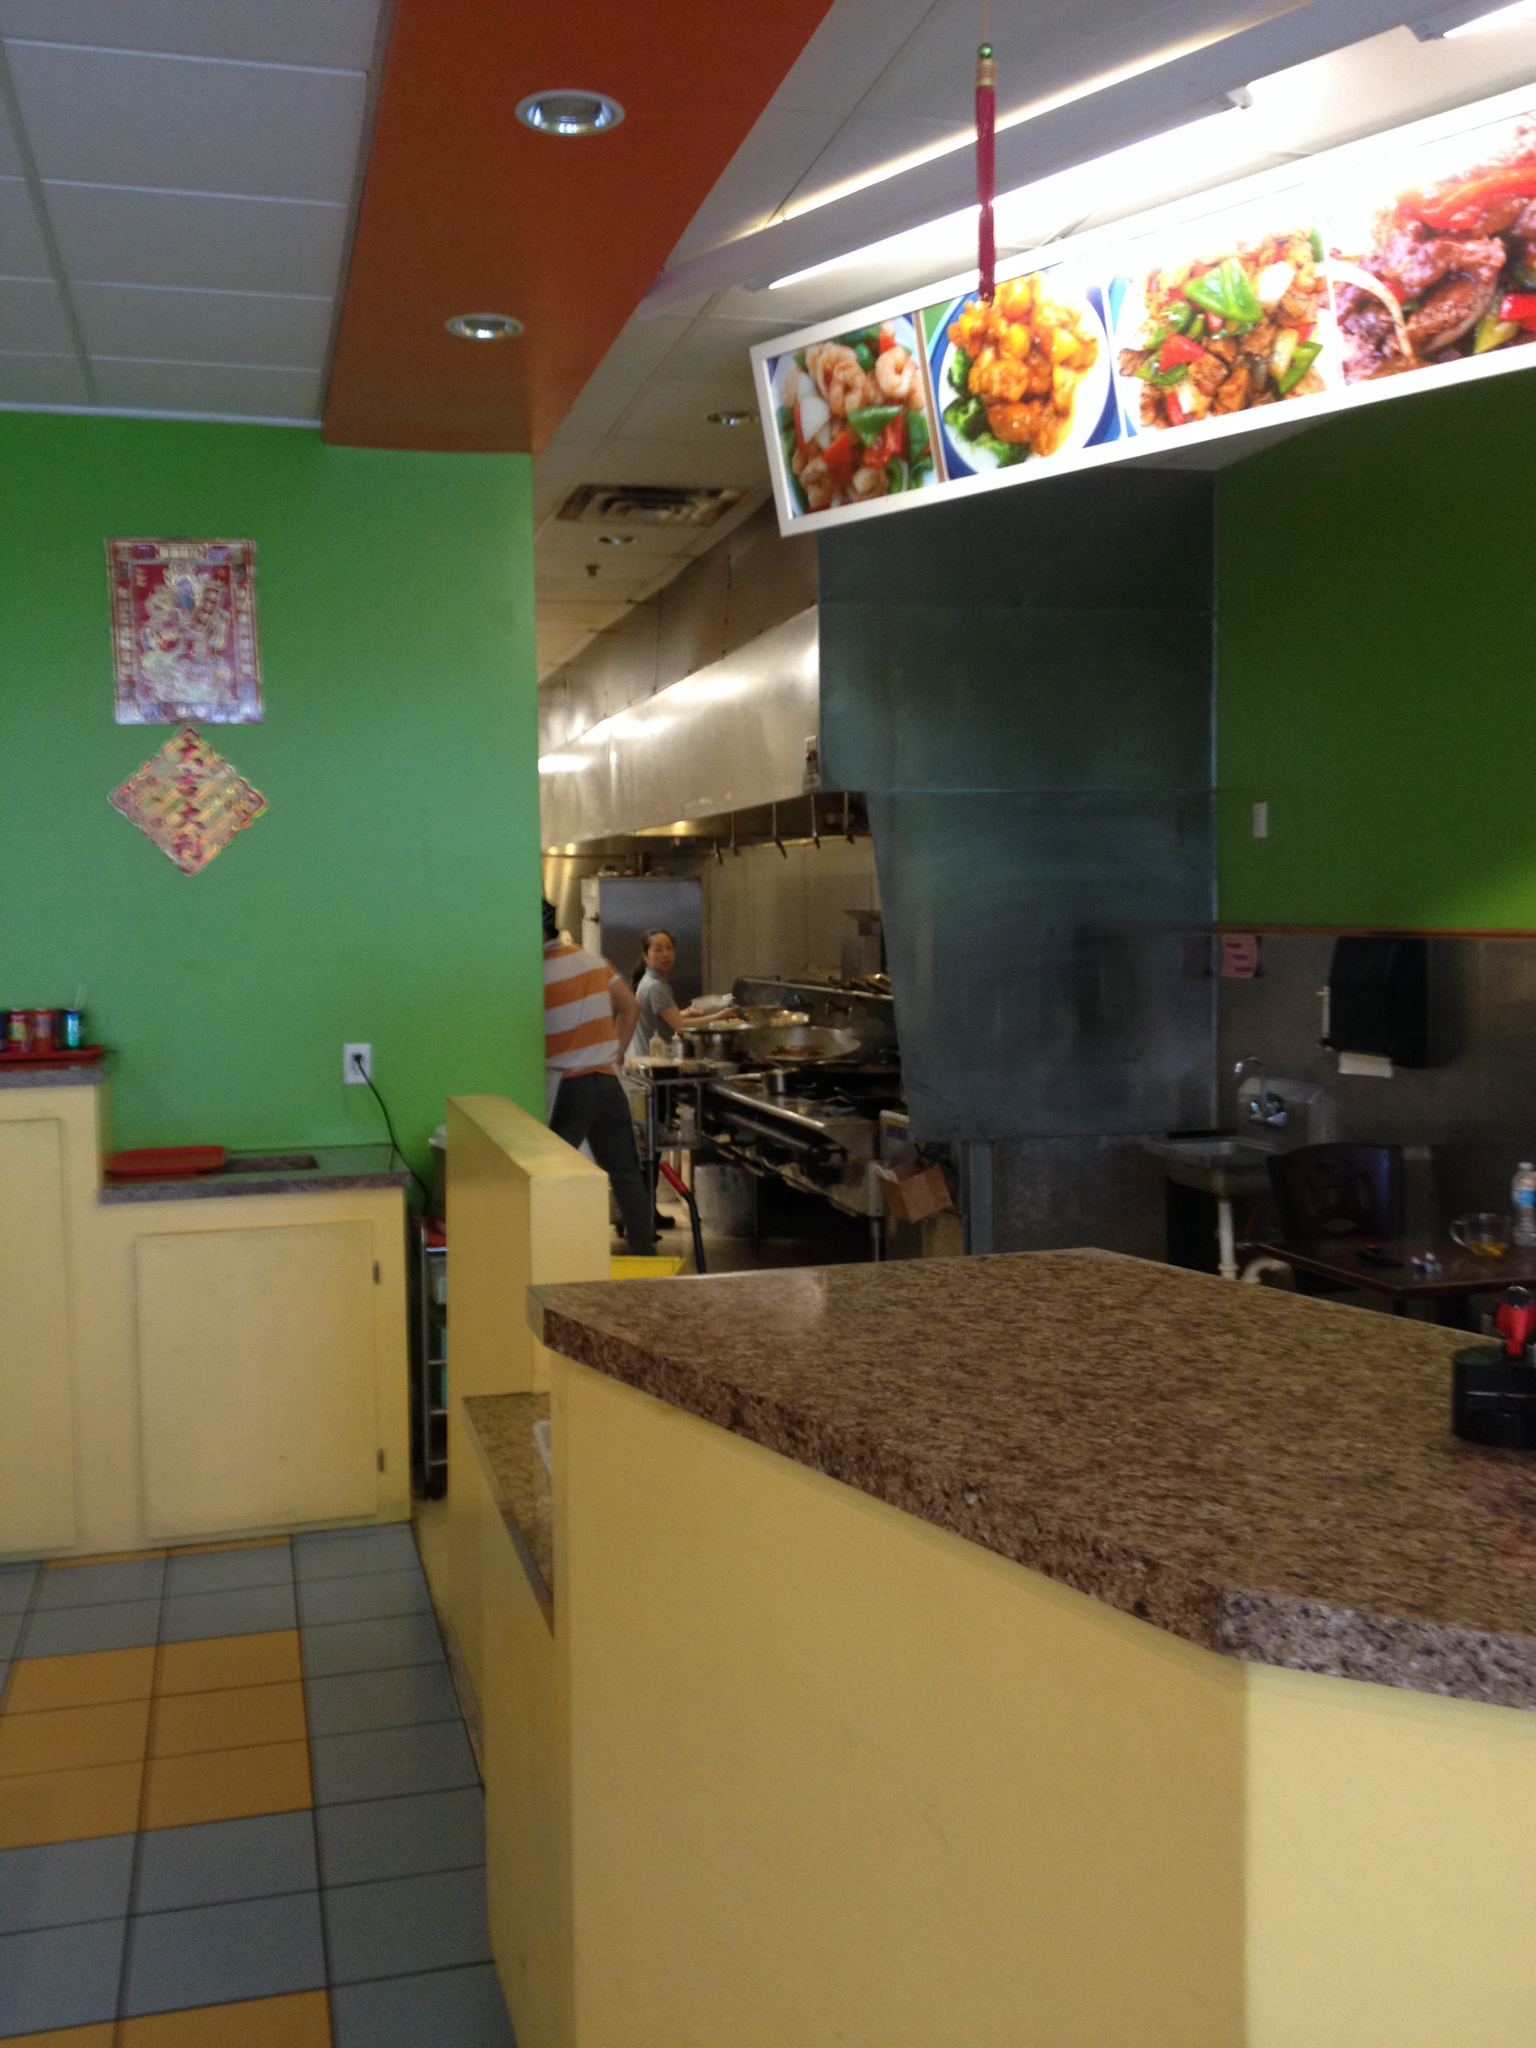 Tea Garden 2500 E Beltline Ave SE Ste H, Grand Rapids, MI 49546 - YP.com